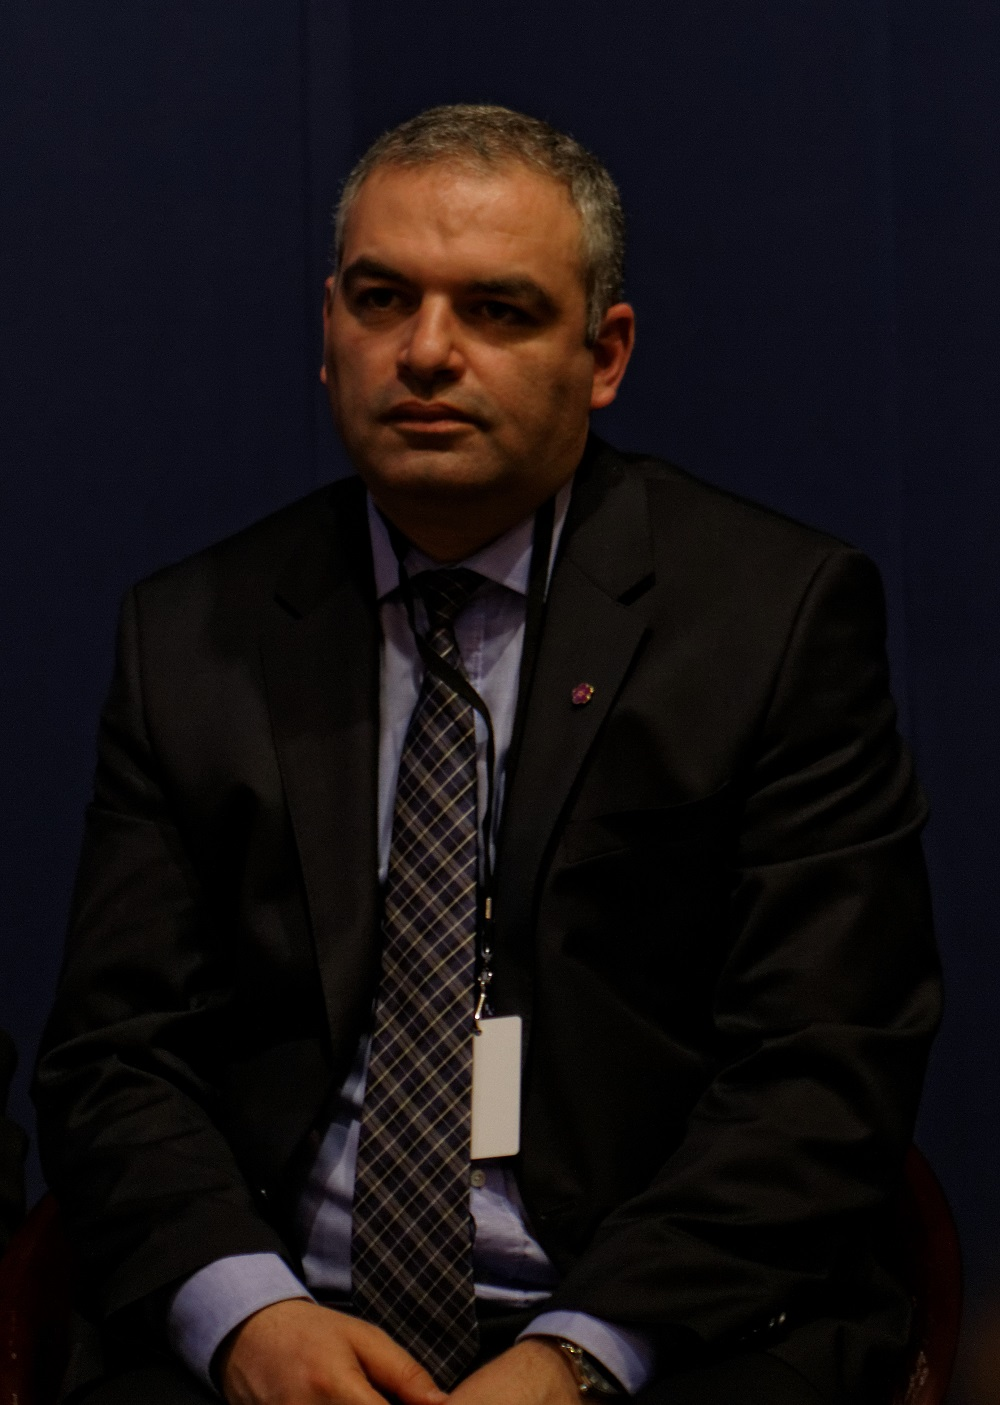 Айк Демоян | wikipedia.org